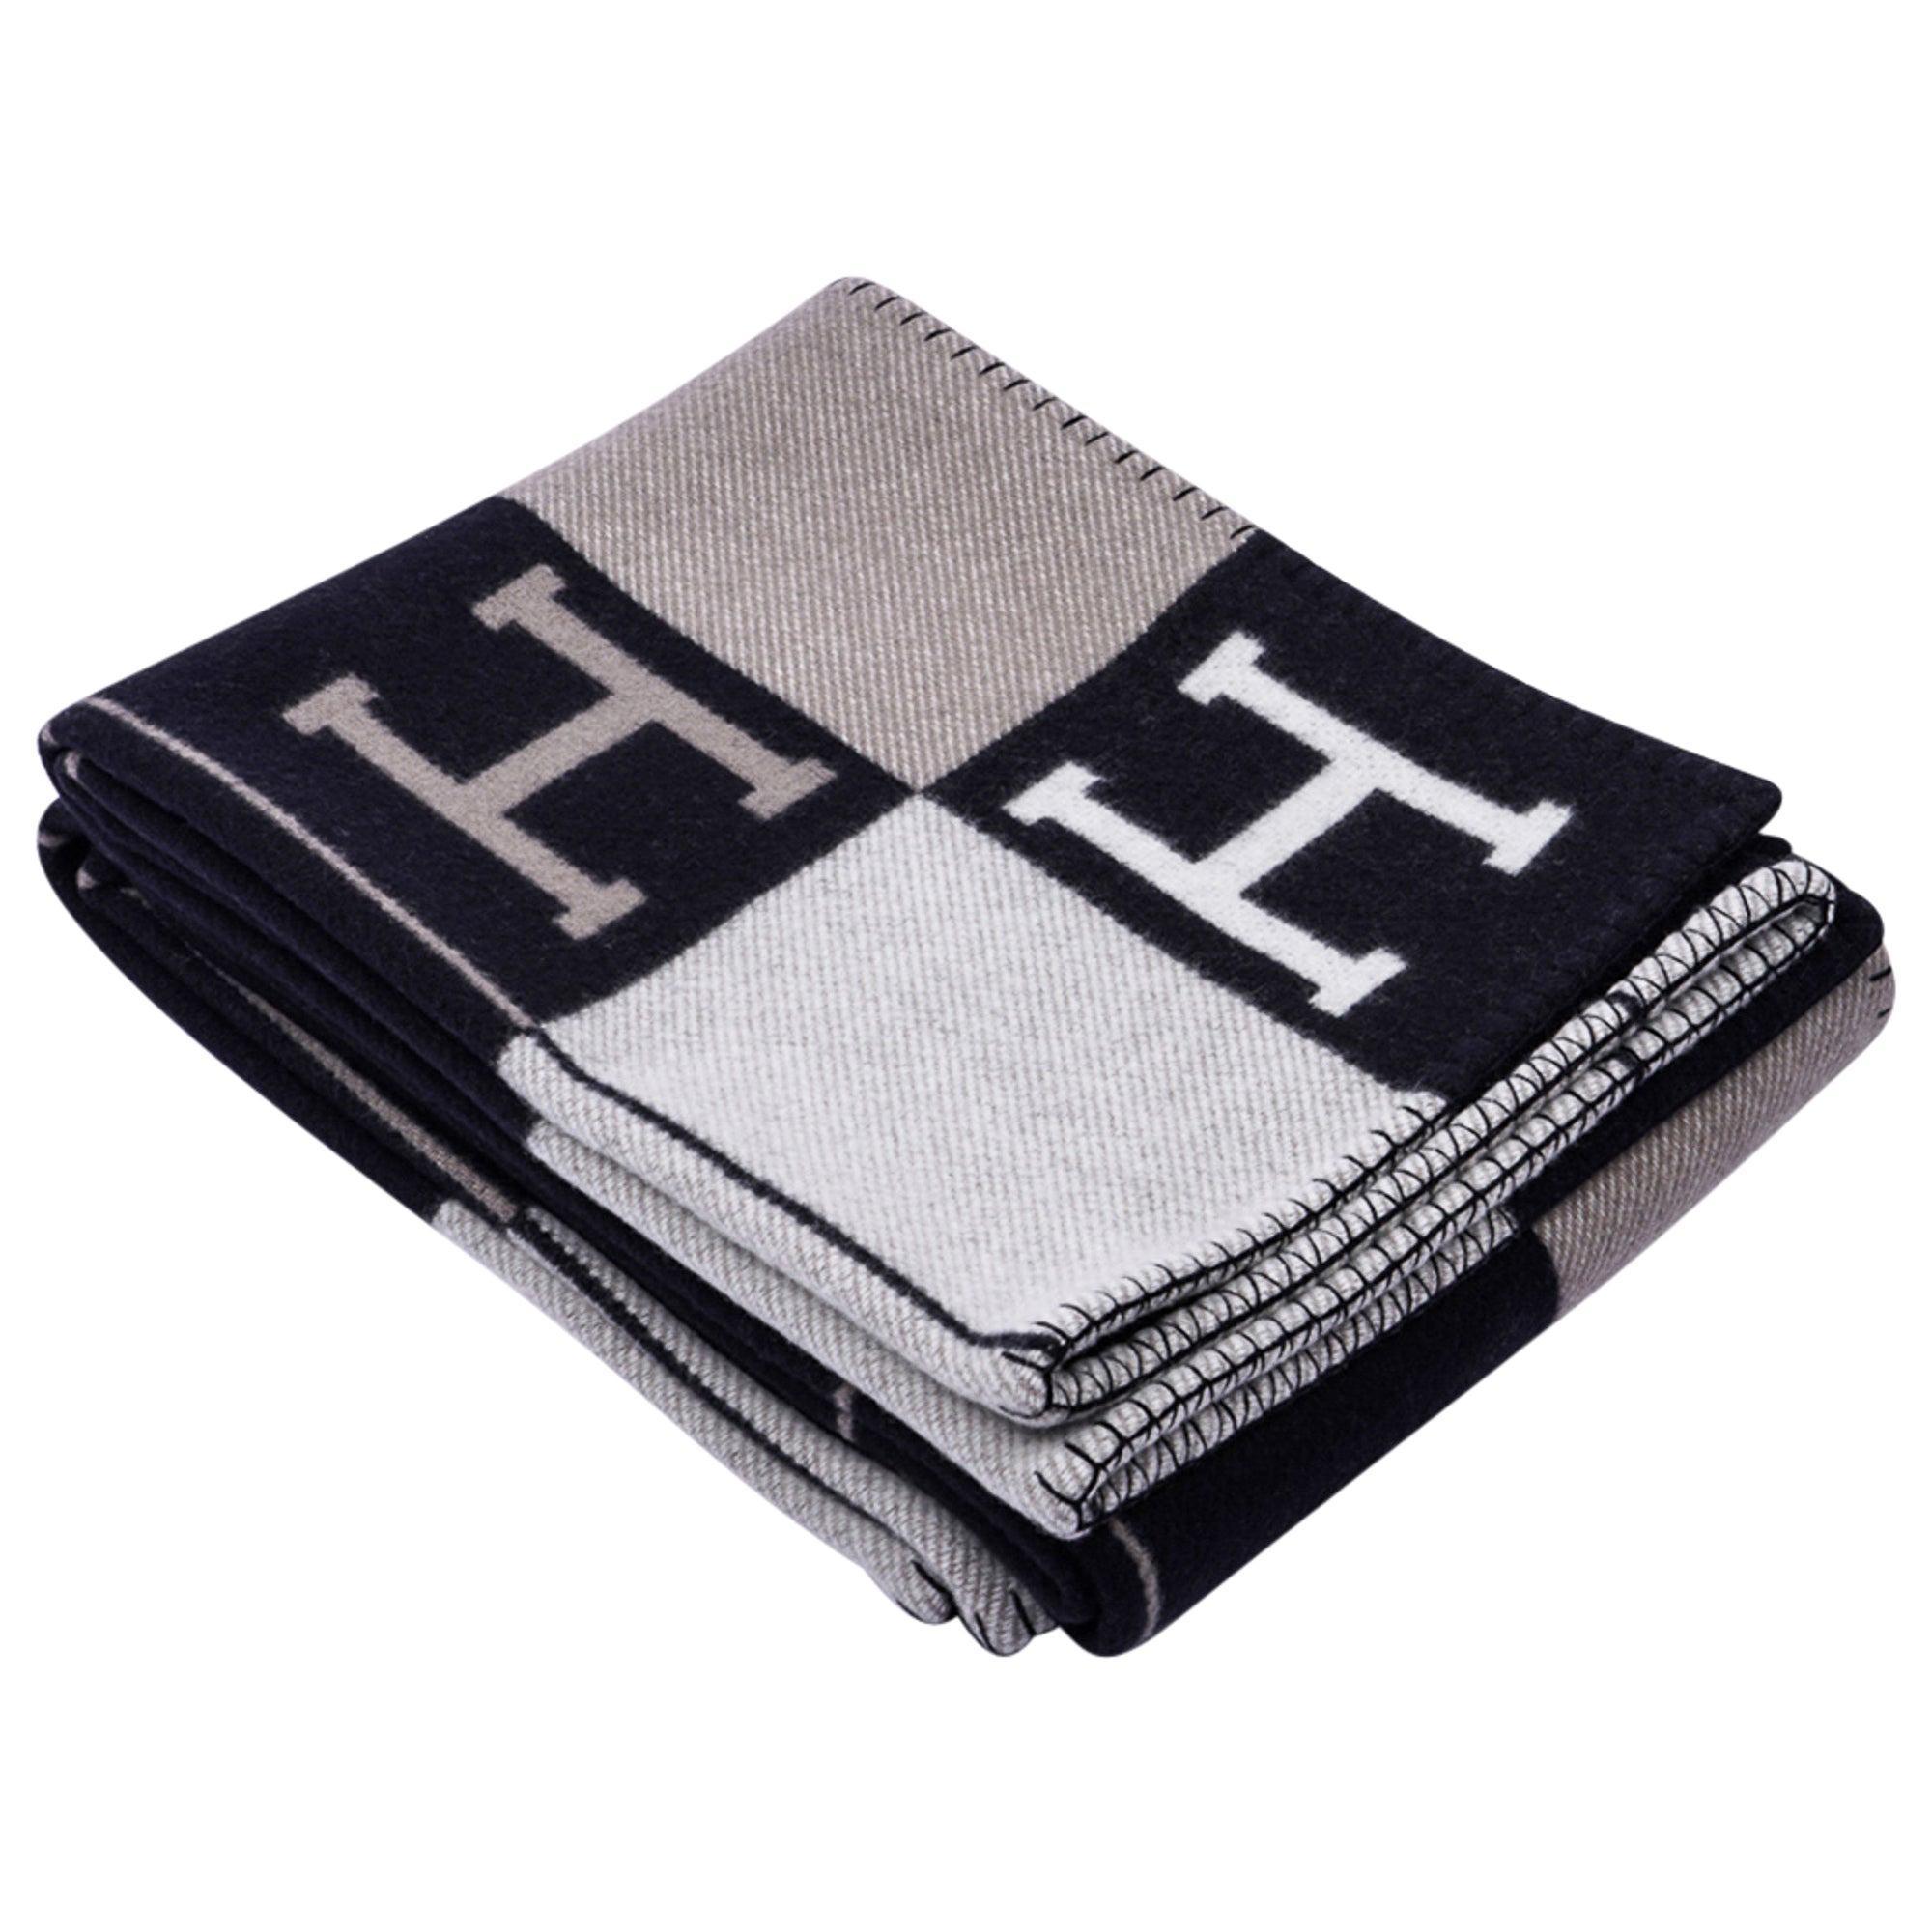 Hermes Blanket Avalon III Black/ Ecru Throw Blanket New w/Box